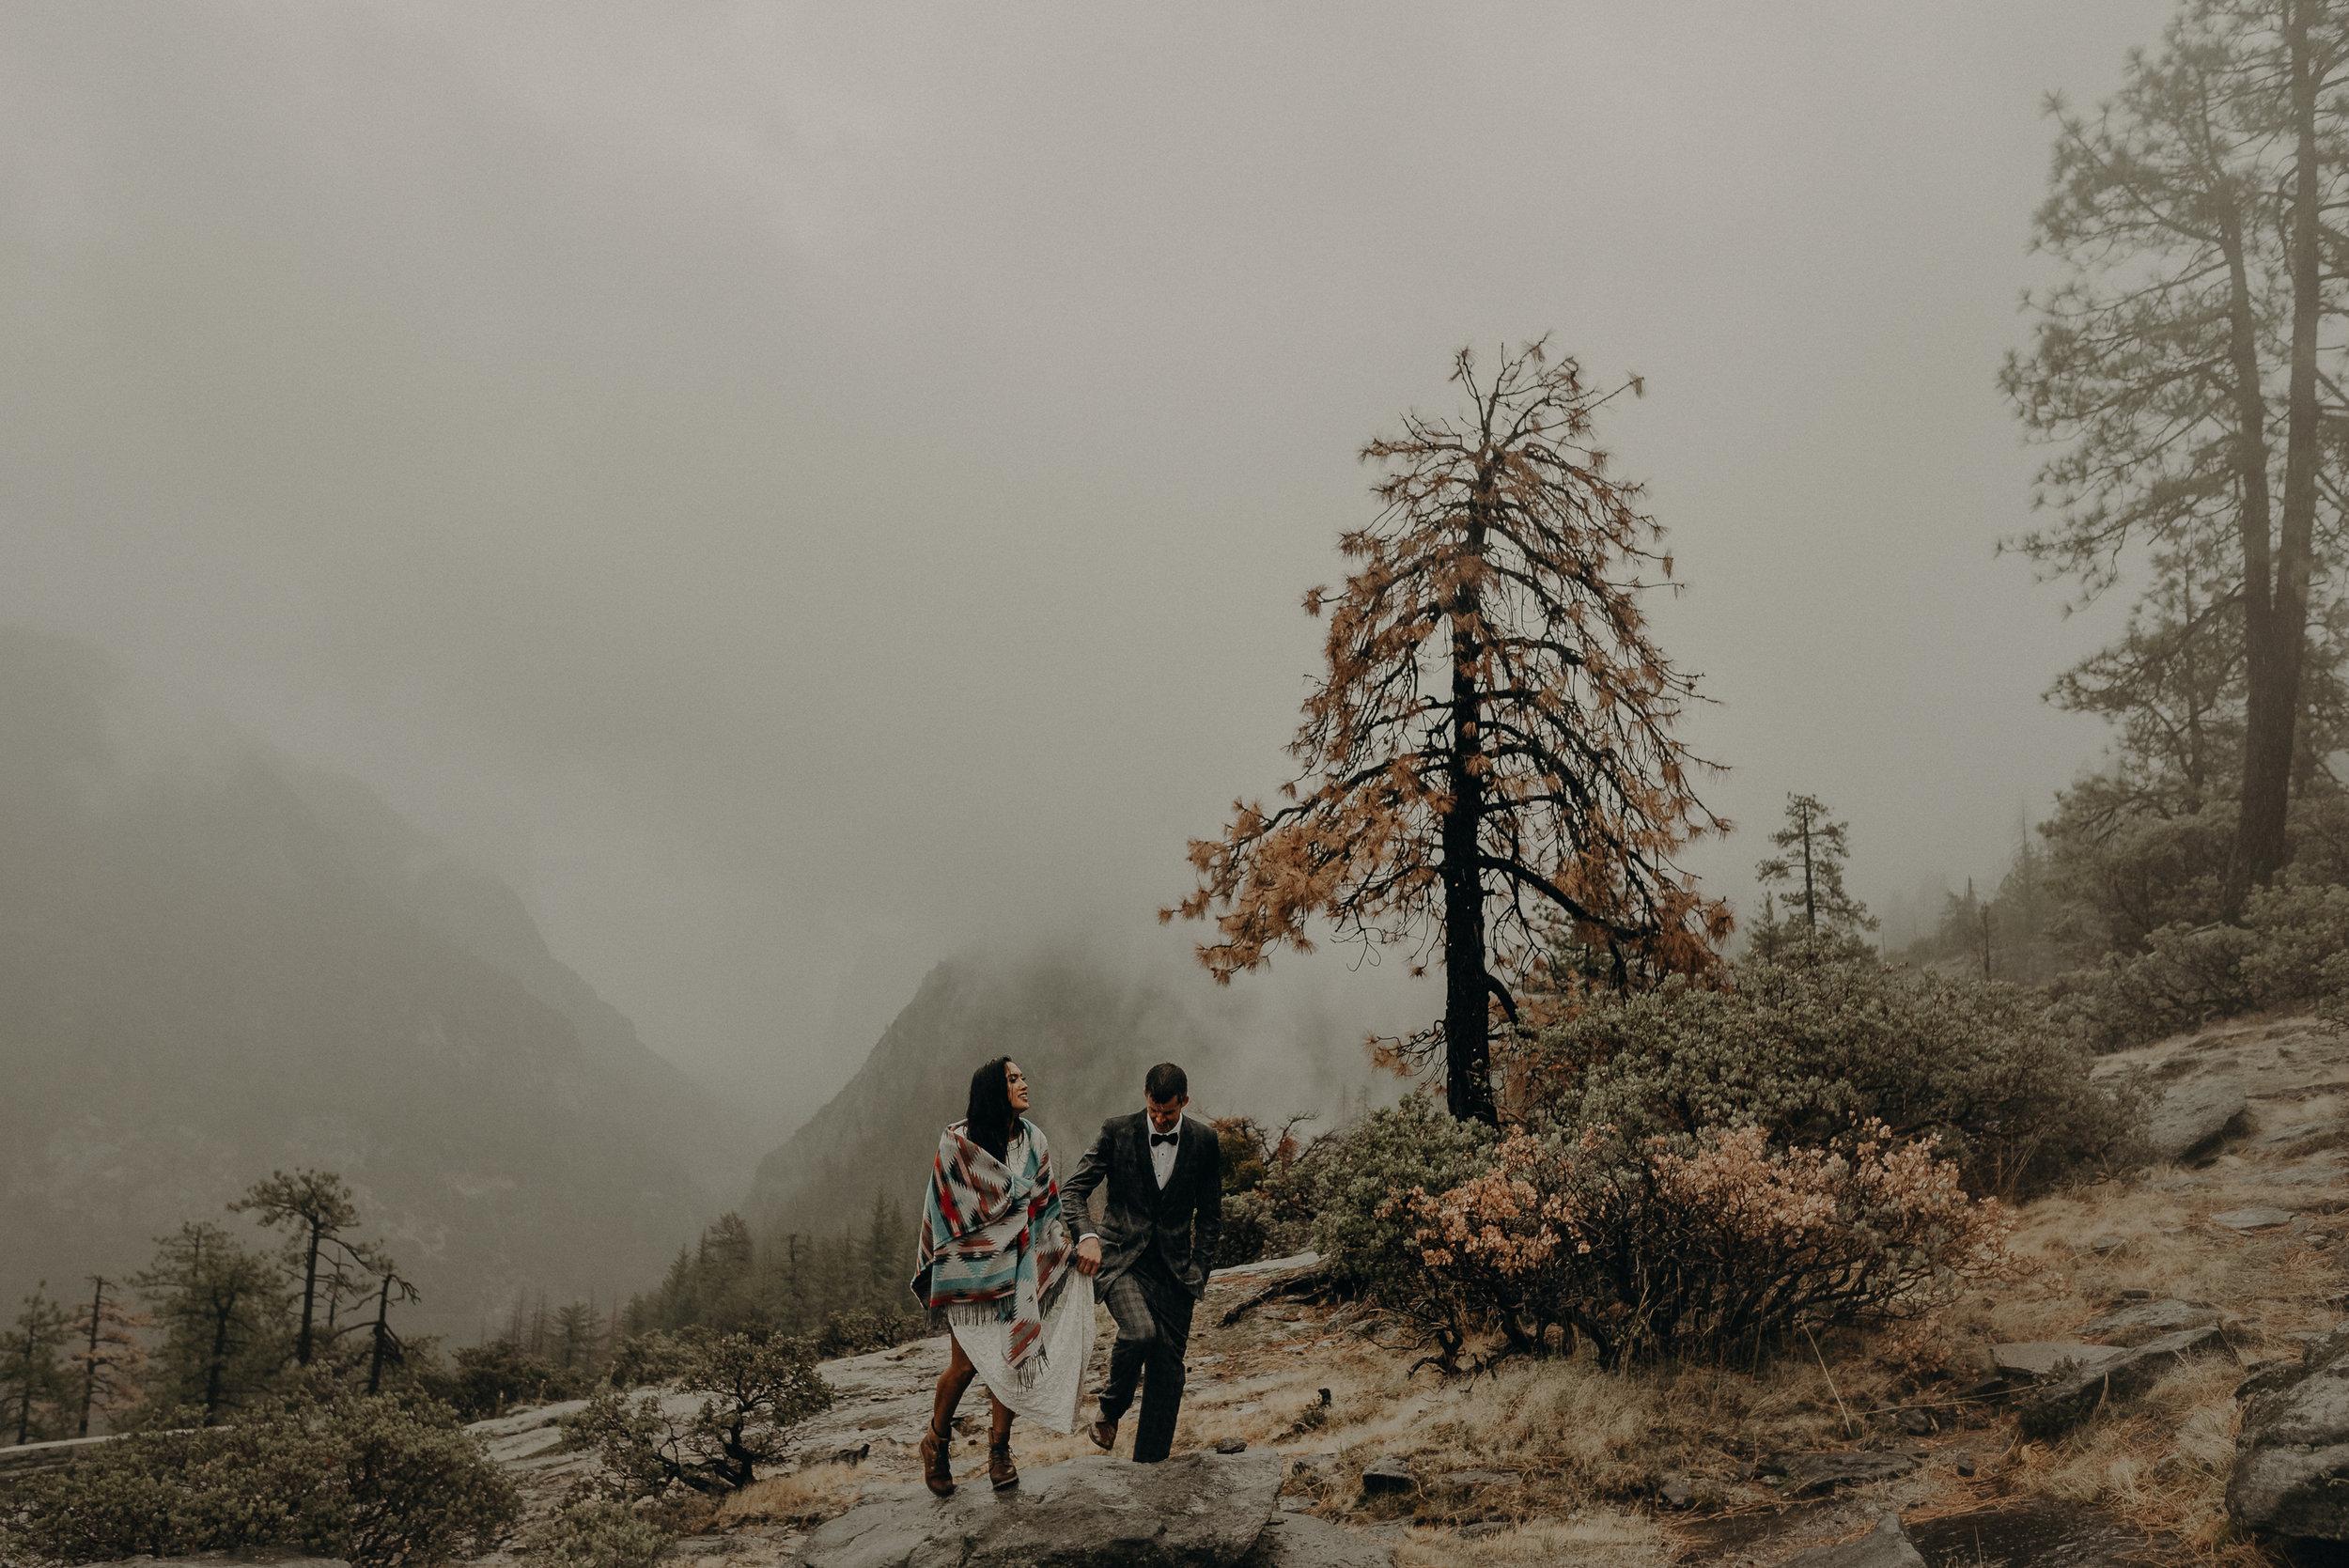 Isaiah + Taylor Photography - Yosemite Elopement - Los Angeles Wedding Photographer-47.jpg